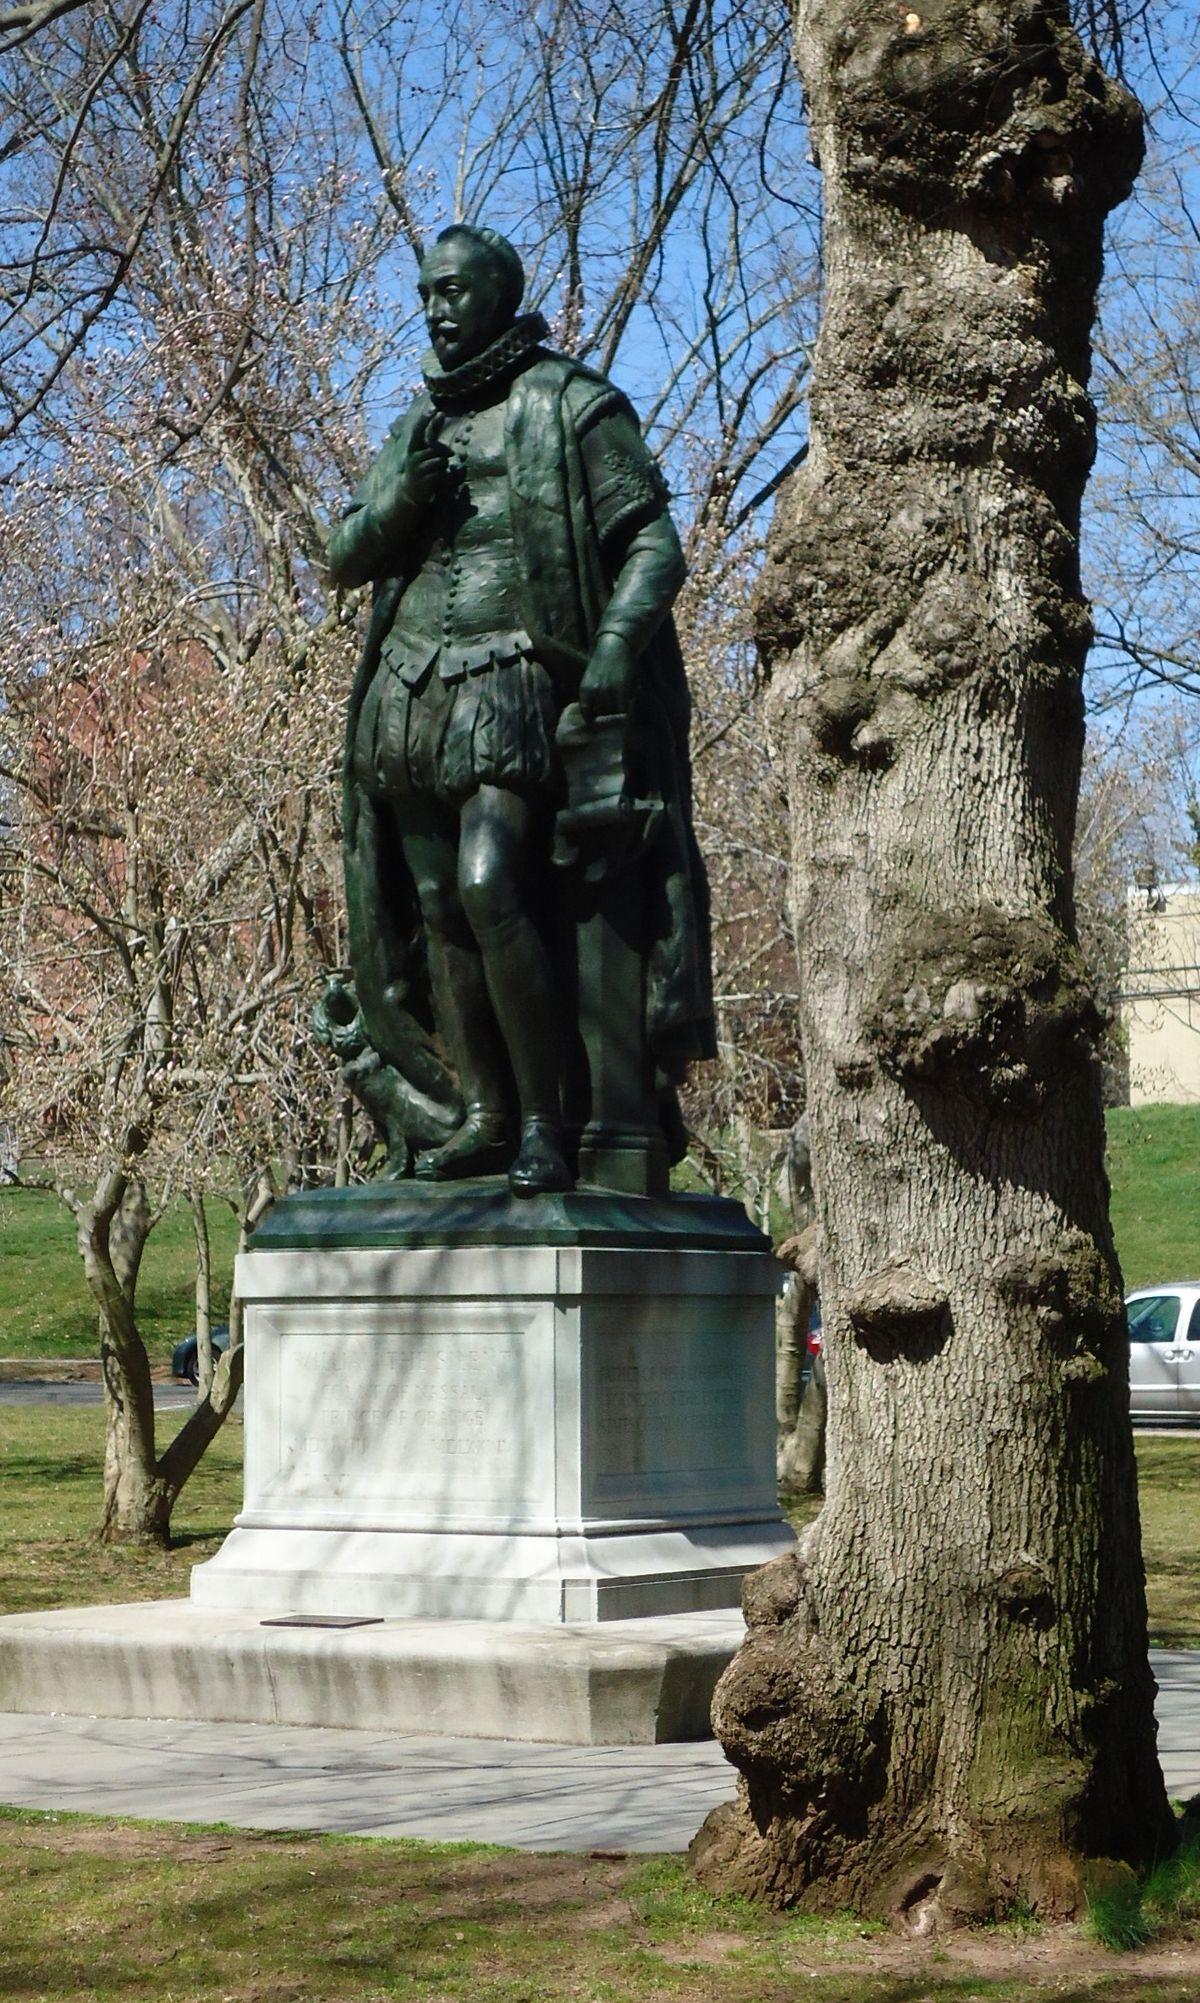 Statue of William the Silent - Wikipedia